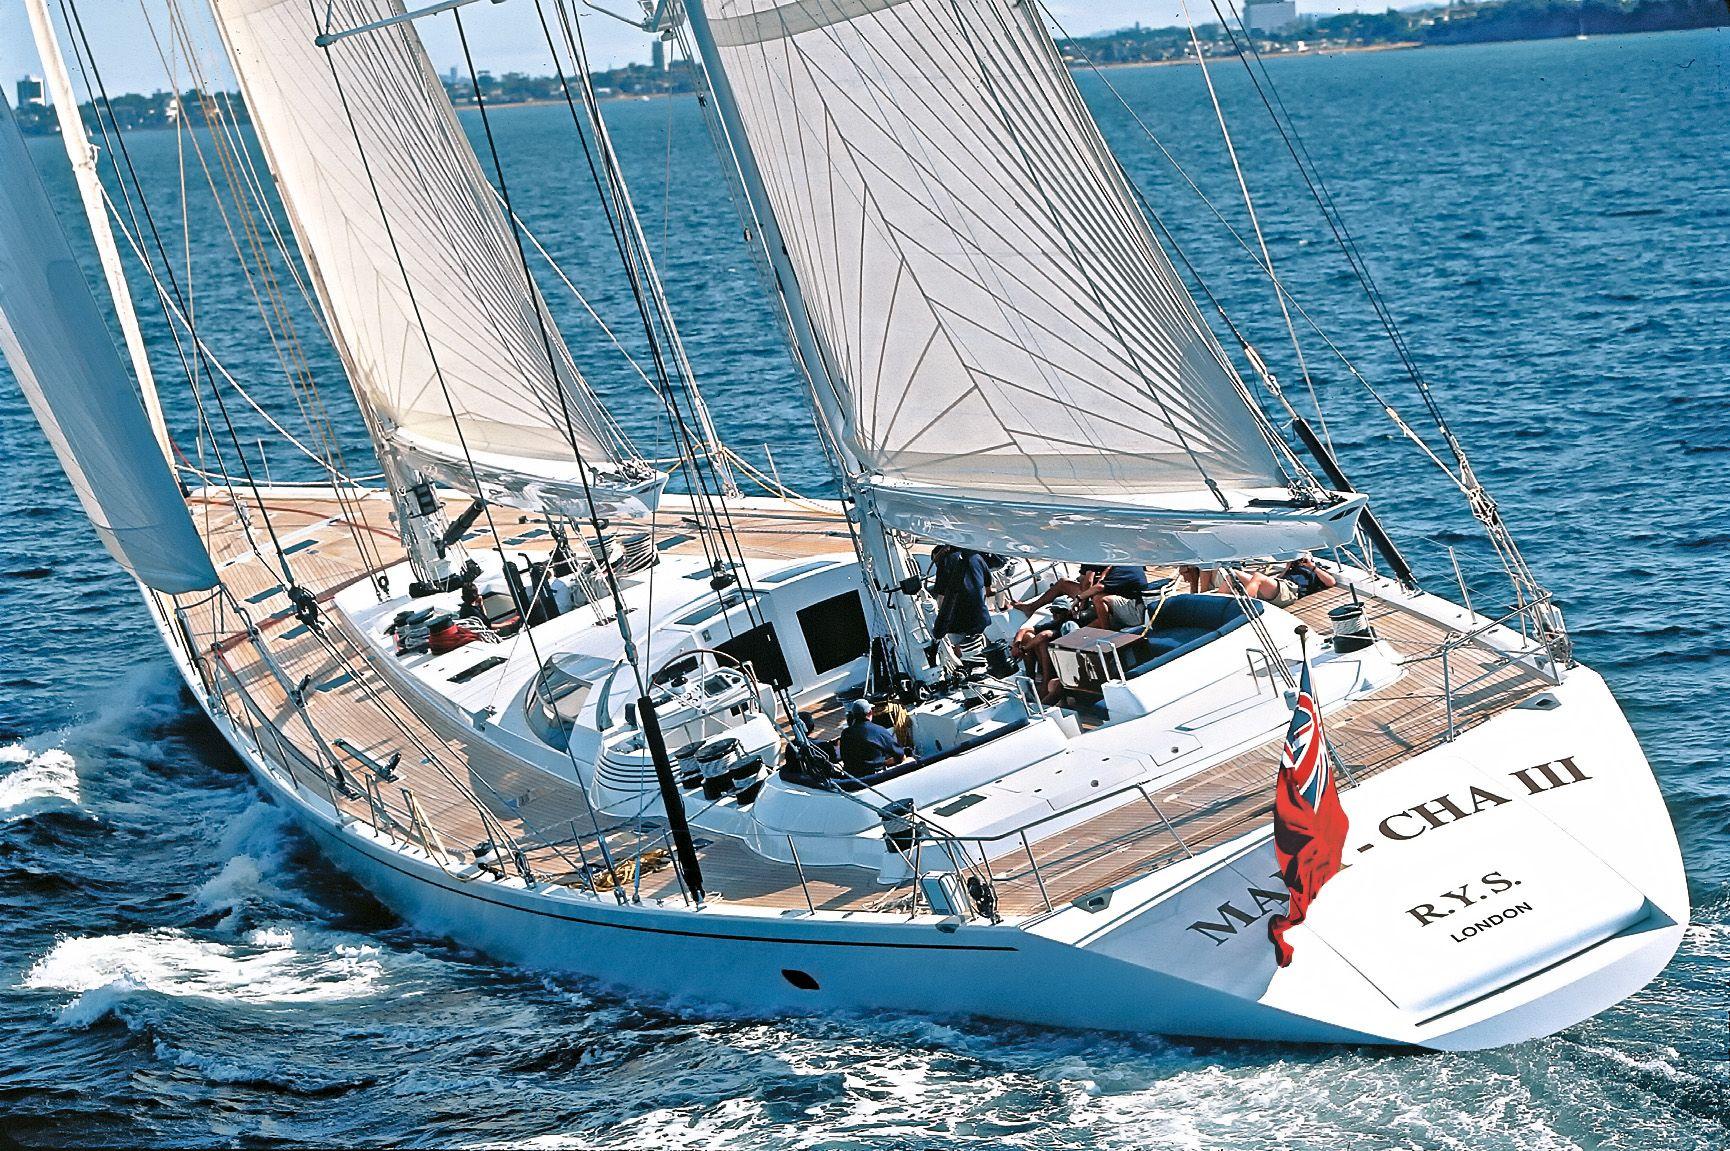 SY. Mari Cha III under sail...